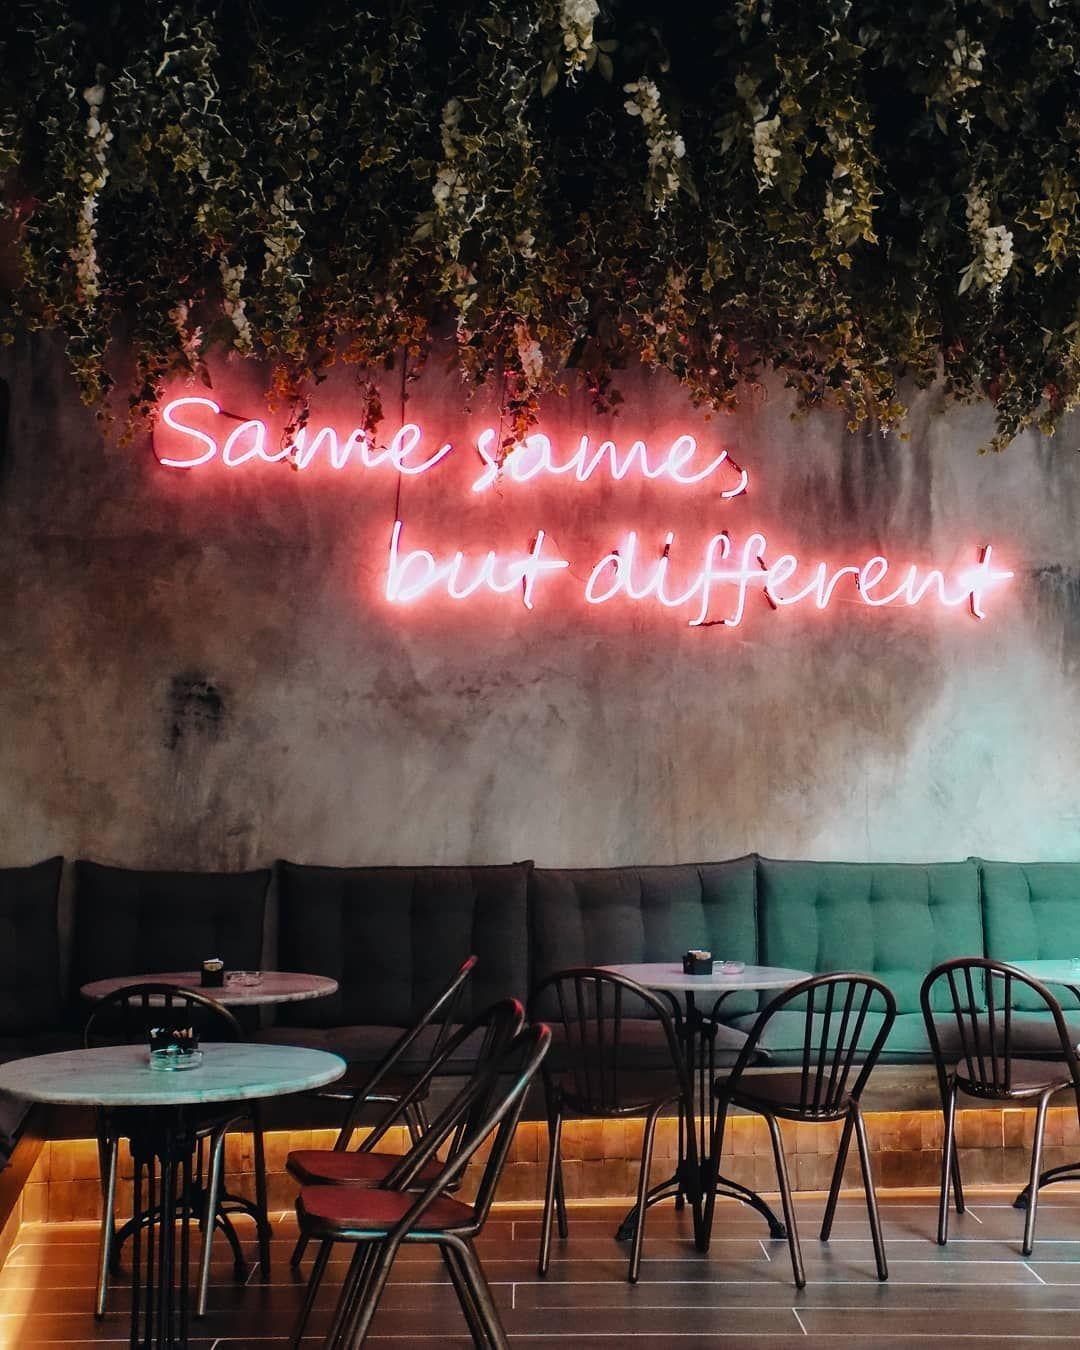 Same Same But Different At Sicario Allday Bar Landscapelightingdesign Restaurant Interior Bar Design Restaurant Restaurant Interior Design